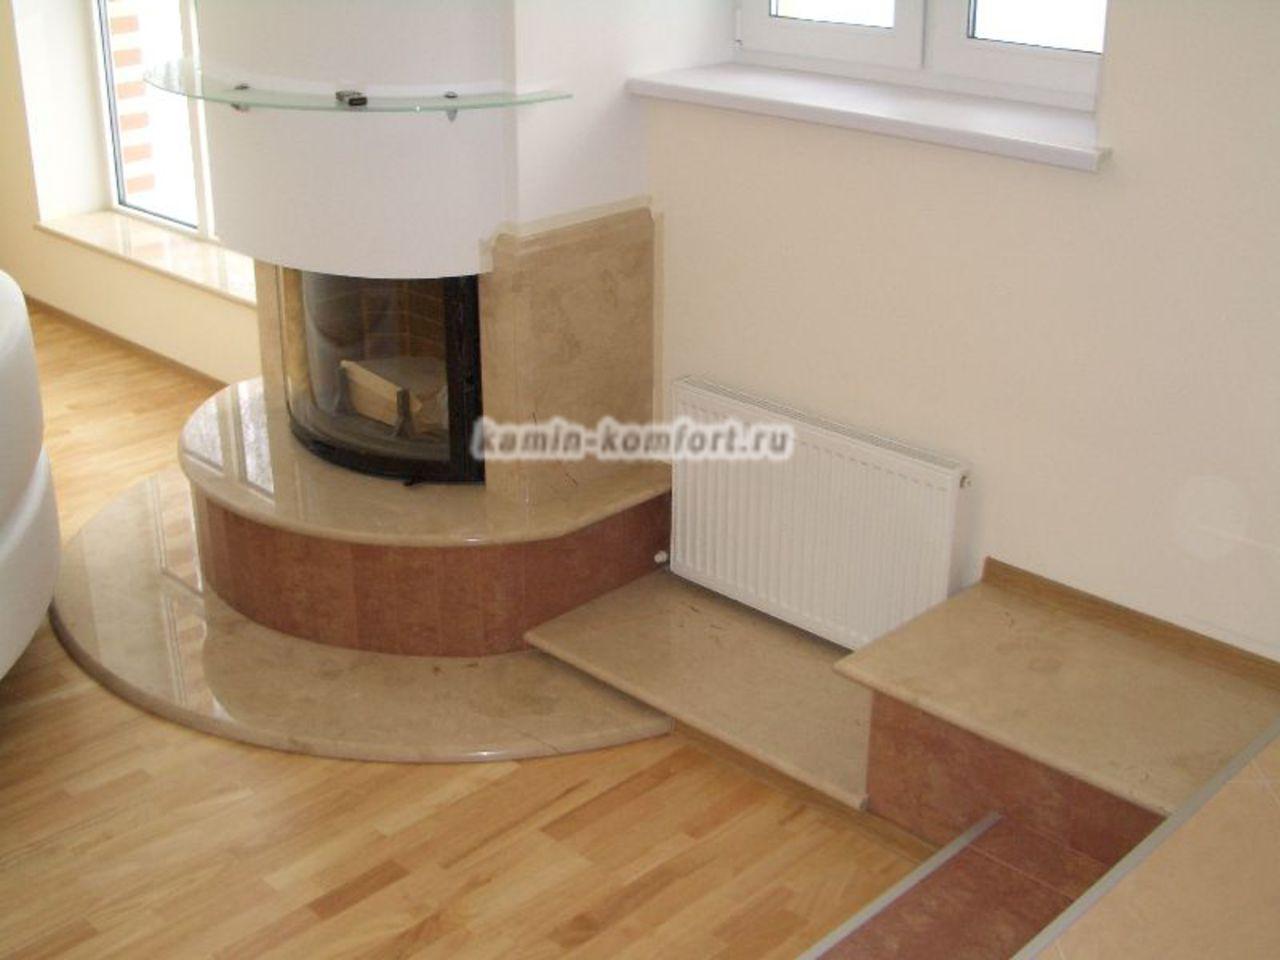 Фото Панорамный мраморный камин